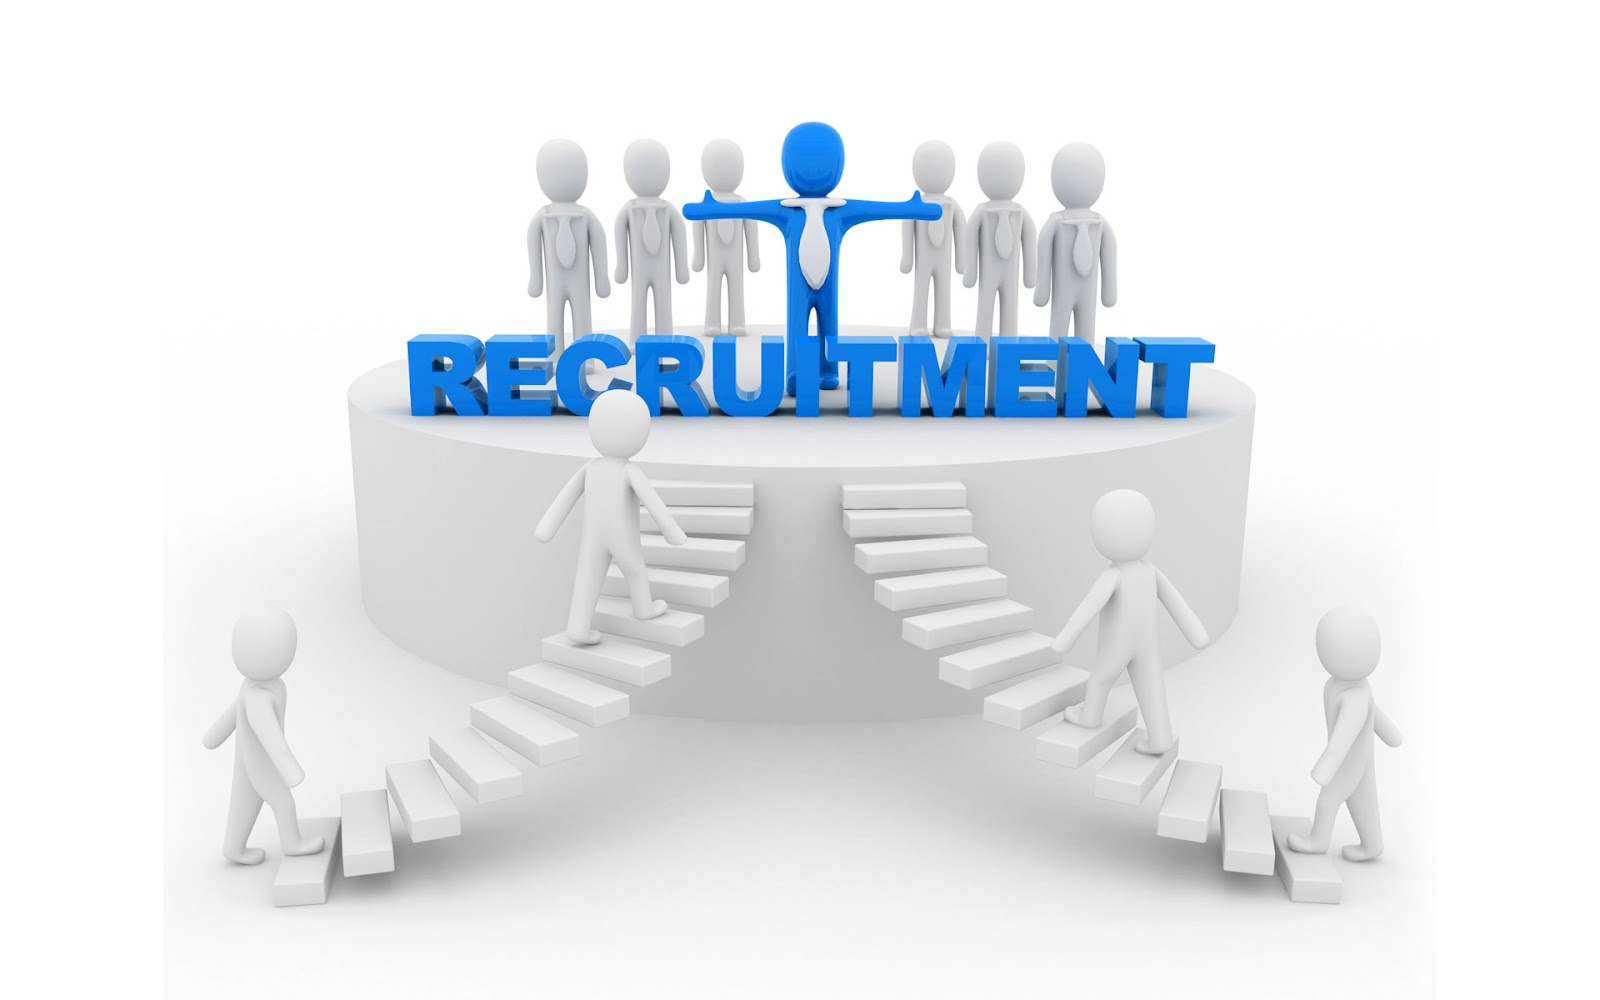 Recruitment and training marketing